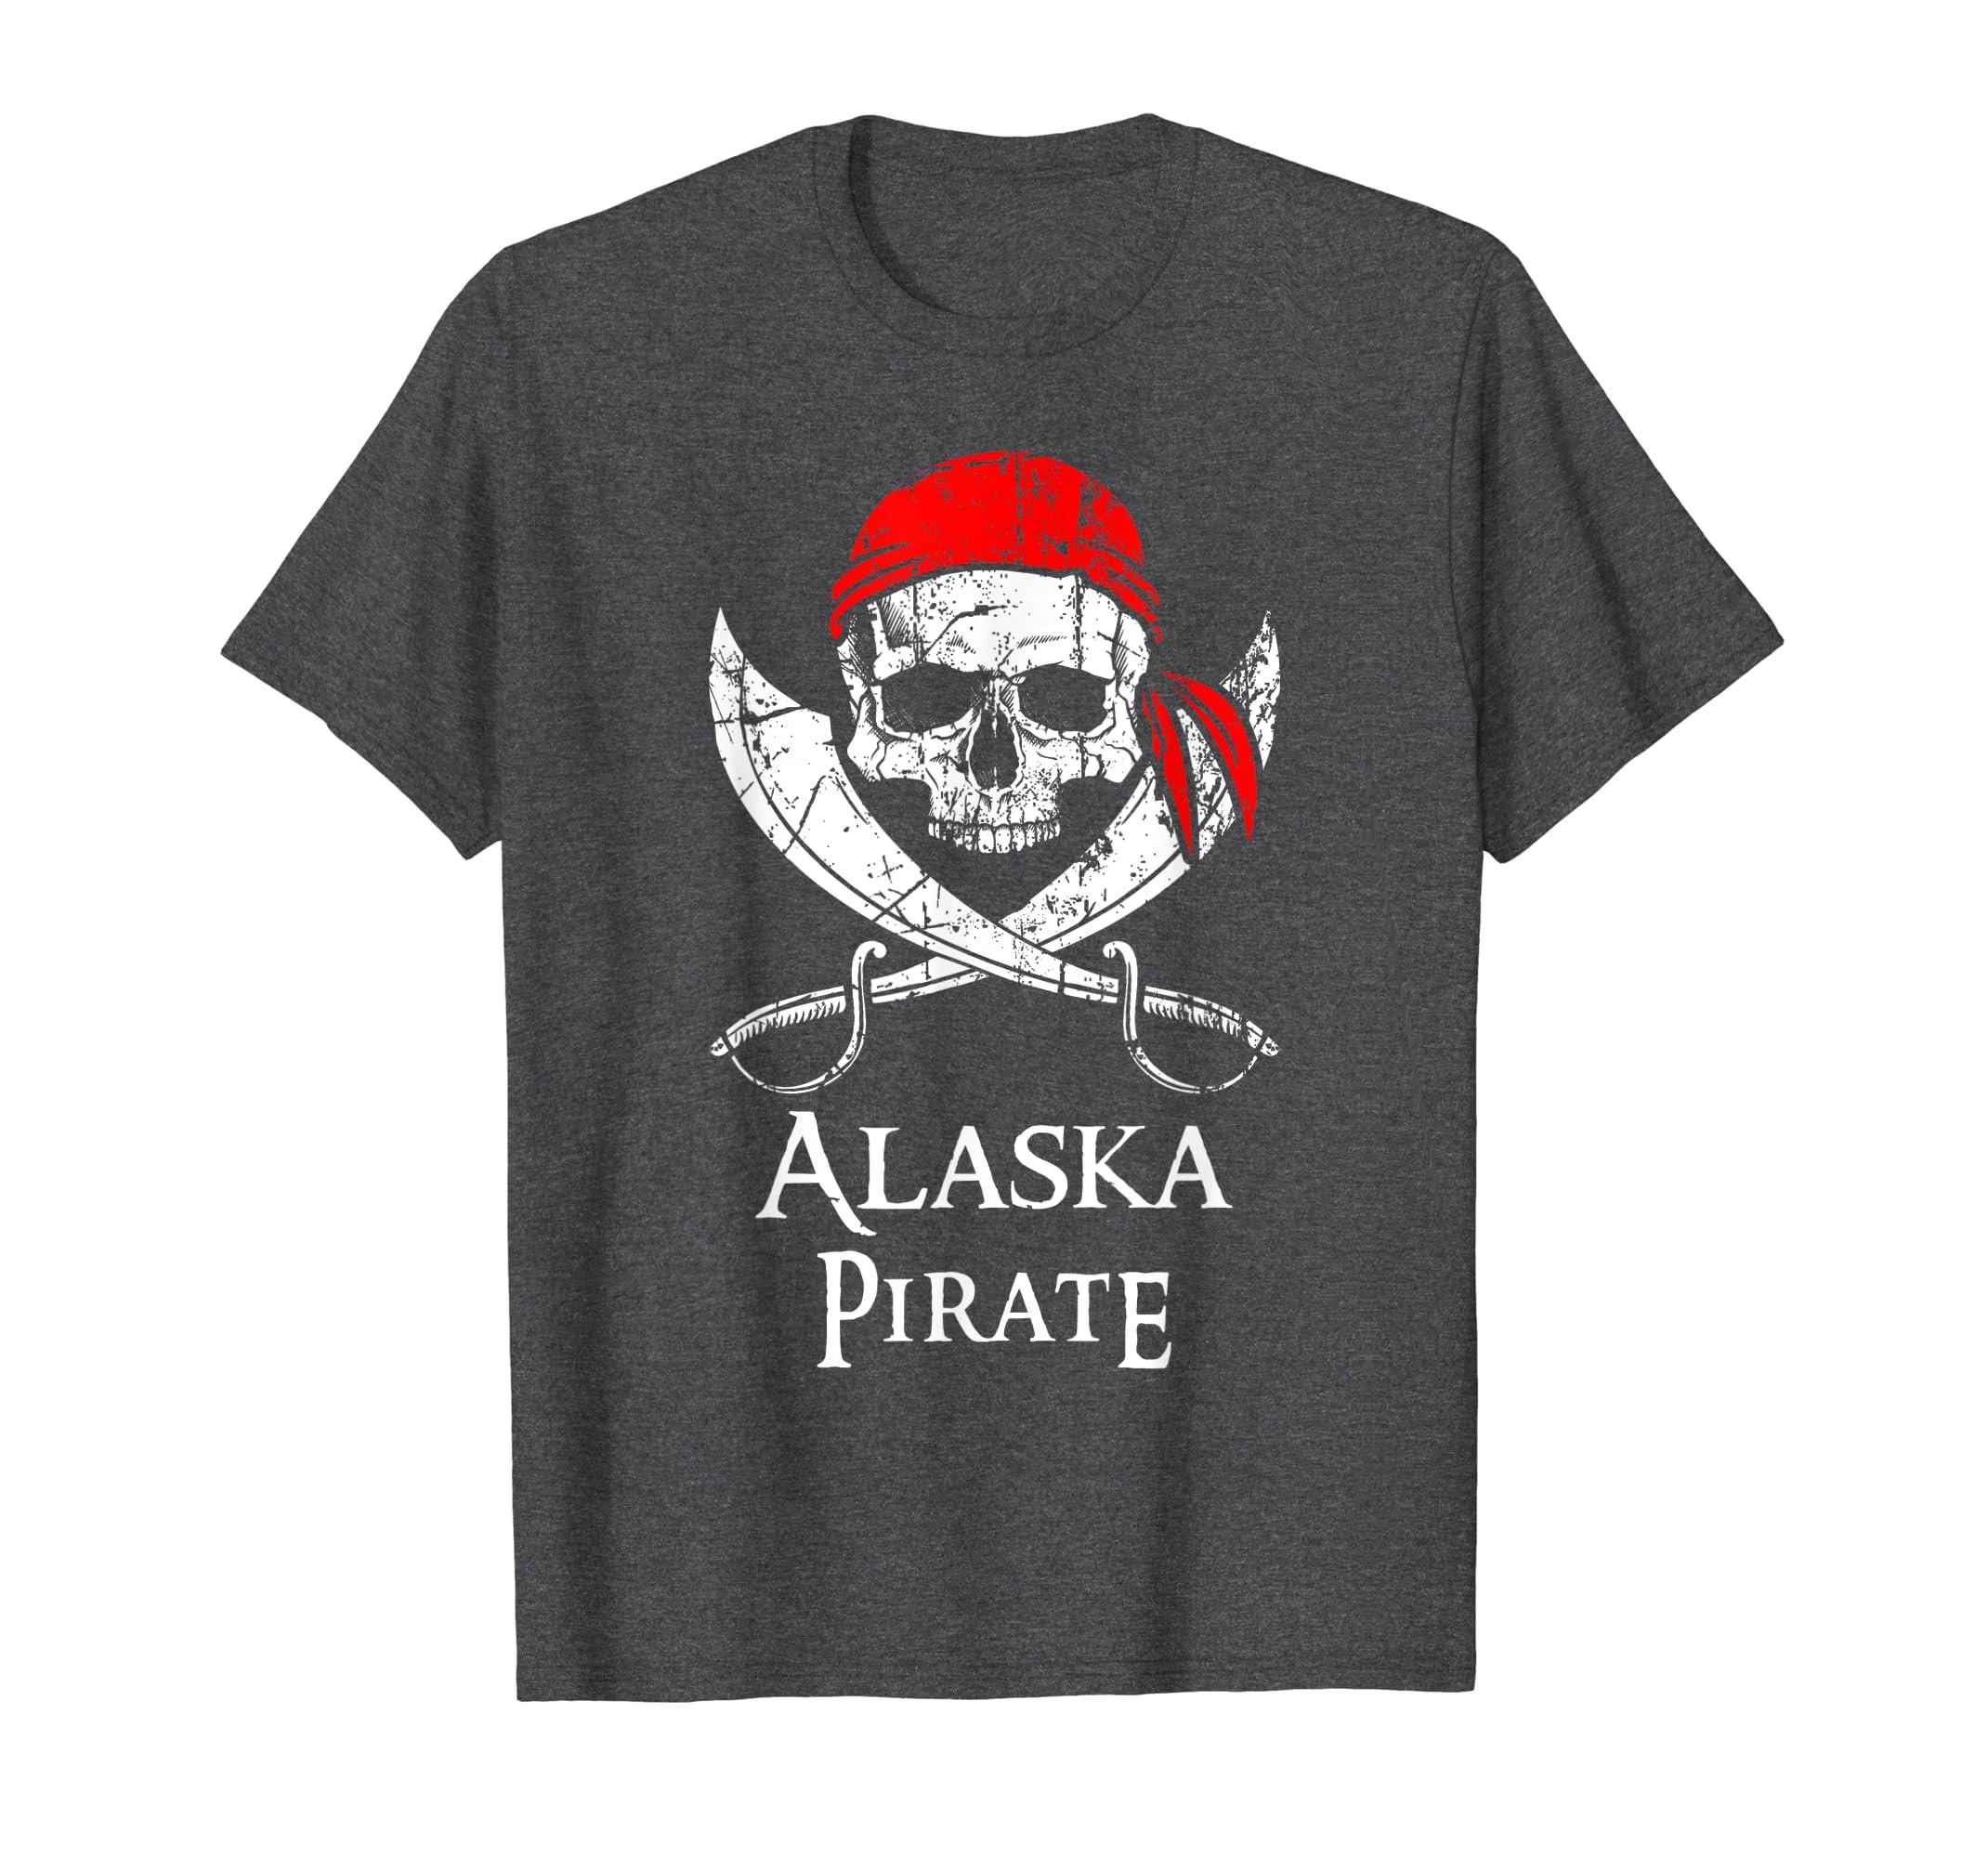 Alaska Pirate Jolly Roger State Pride T-Shirt-Teehay